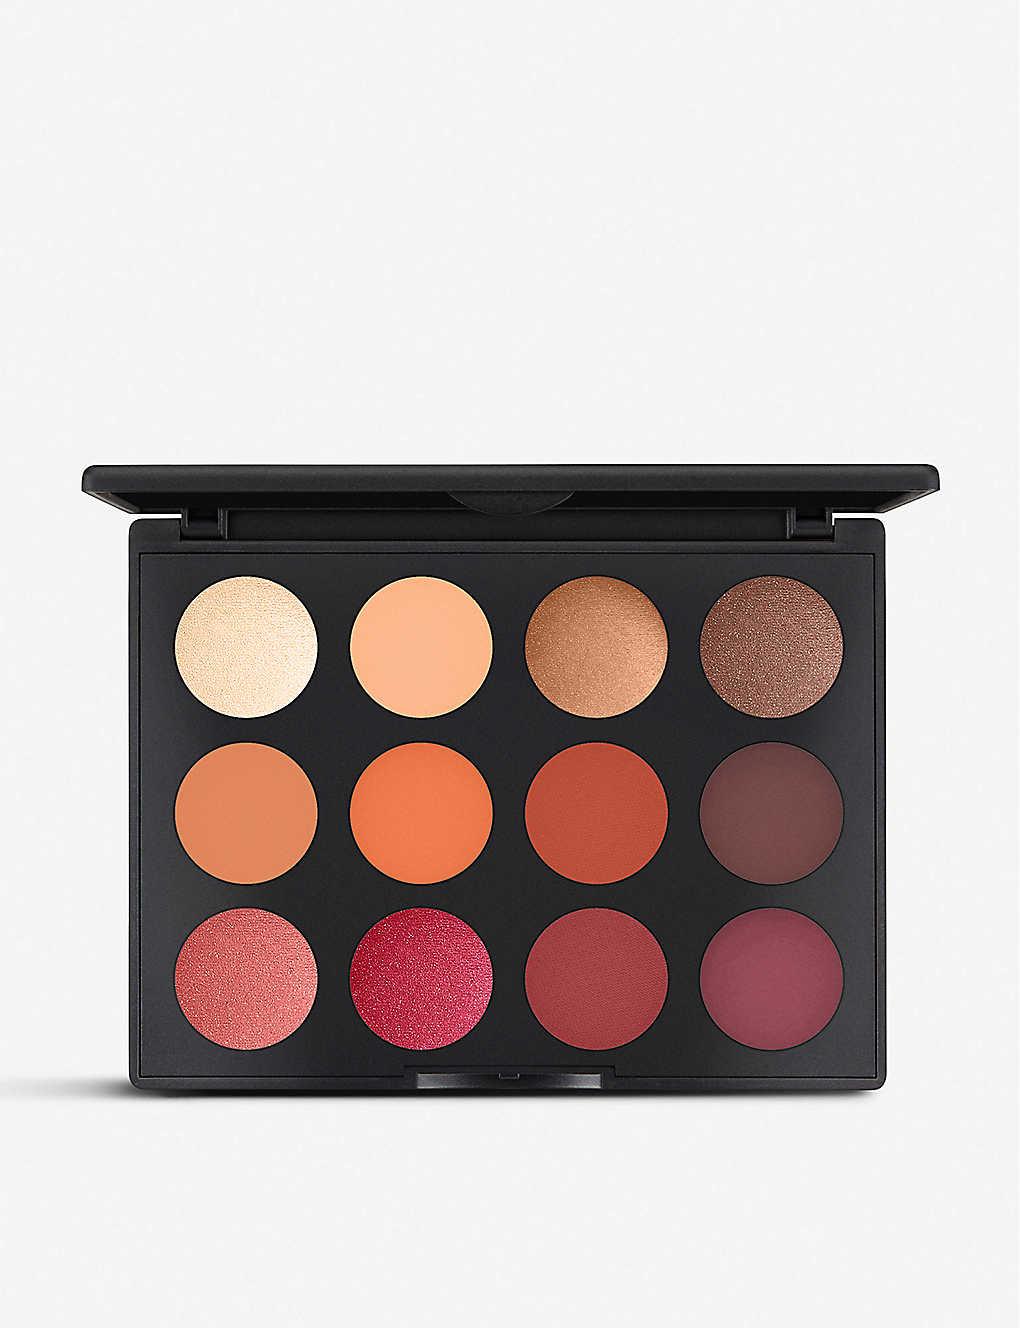 Art Library Eyeshadow Palette 17.2g - Flameboyant